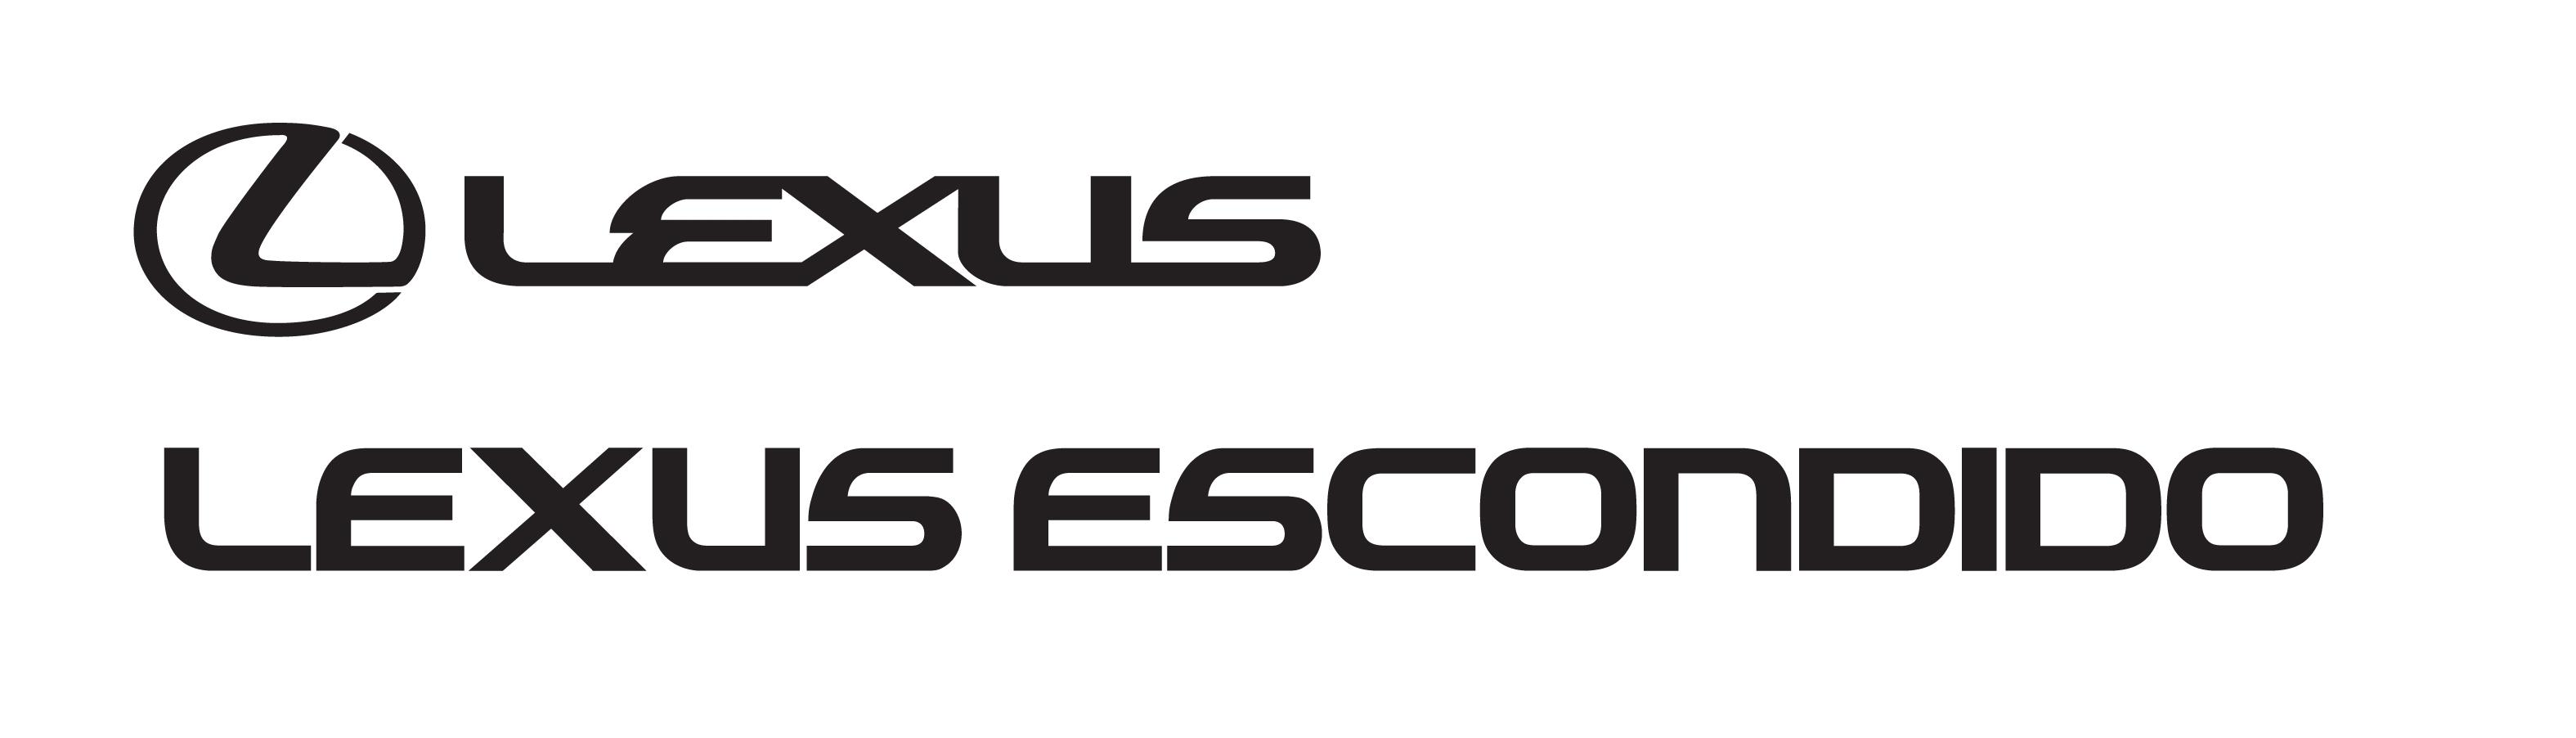 Lexus Escondido